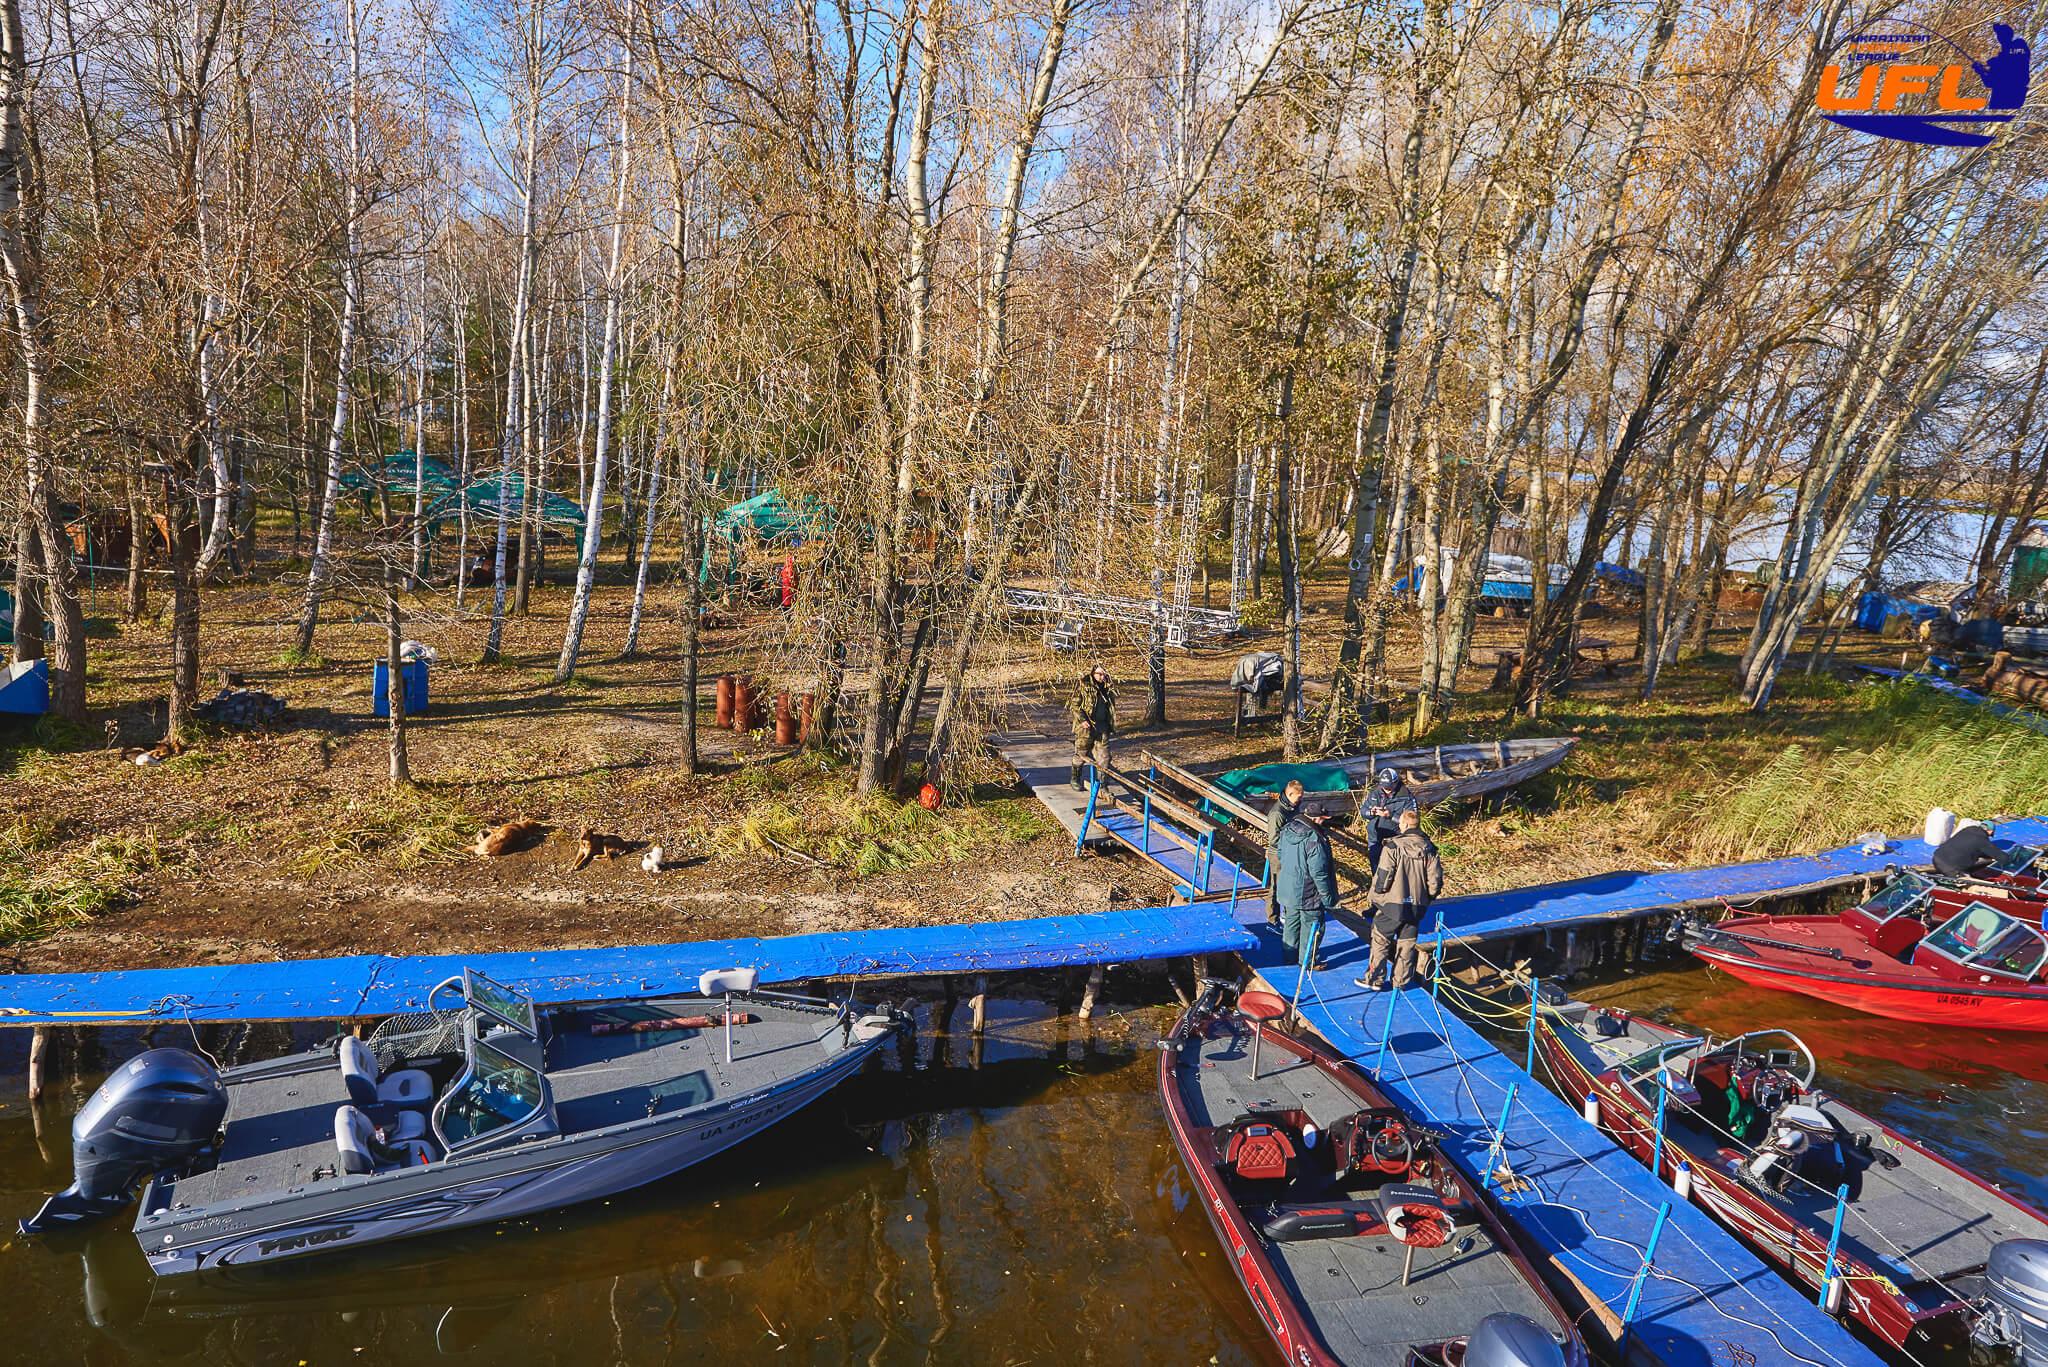 13-den-tishi-pidgotovka-kateriv-do-turniru-ishhenko-sergii-novgorodskii-igor-davidenko-denis-semenov-oleksii